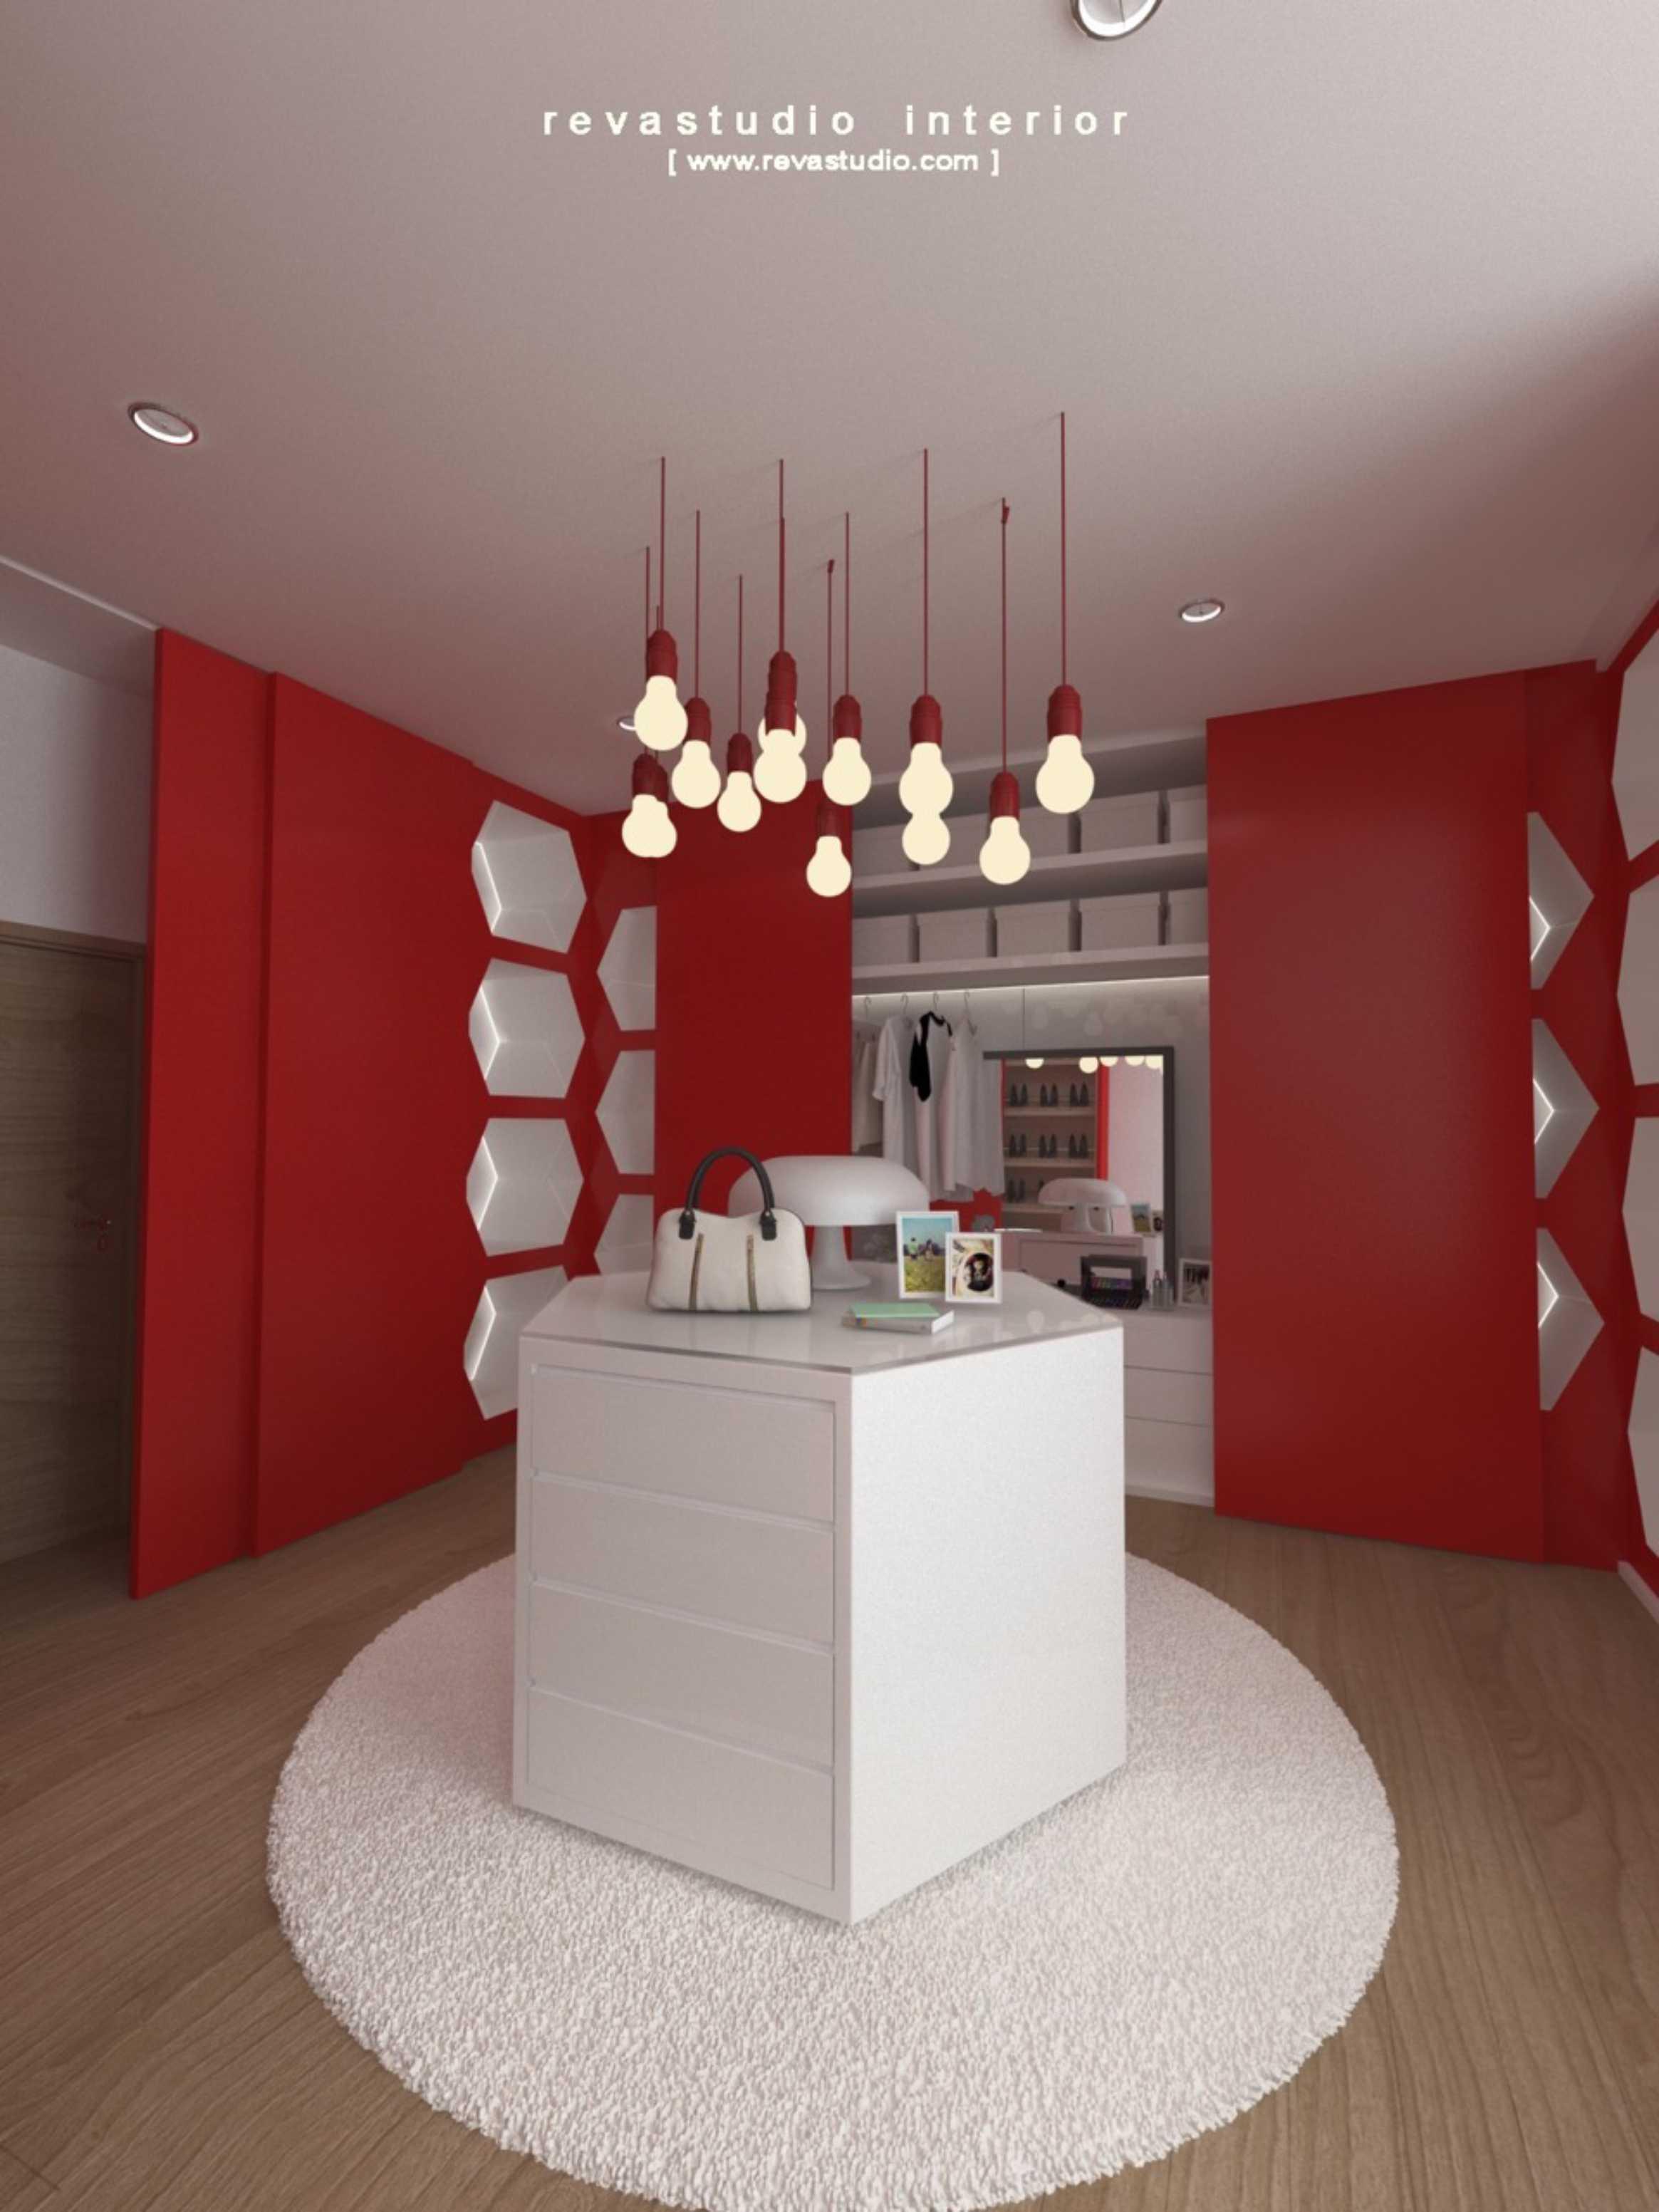 Revano Satria Red Lapin Apartment Jakarta, Indonesia Jakarta, Indonesia Bedroom-Area-2   15551